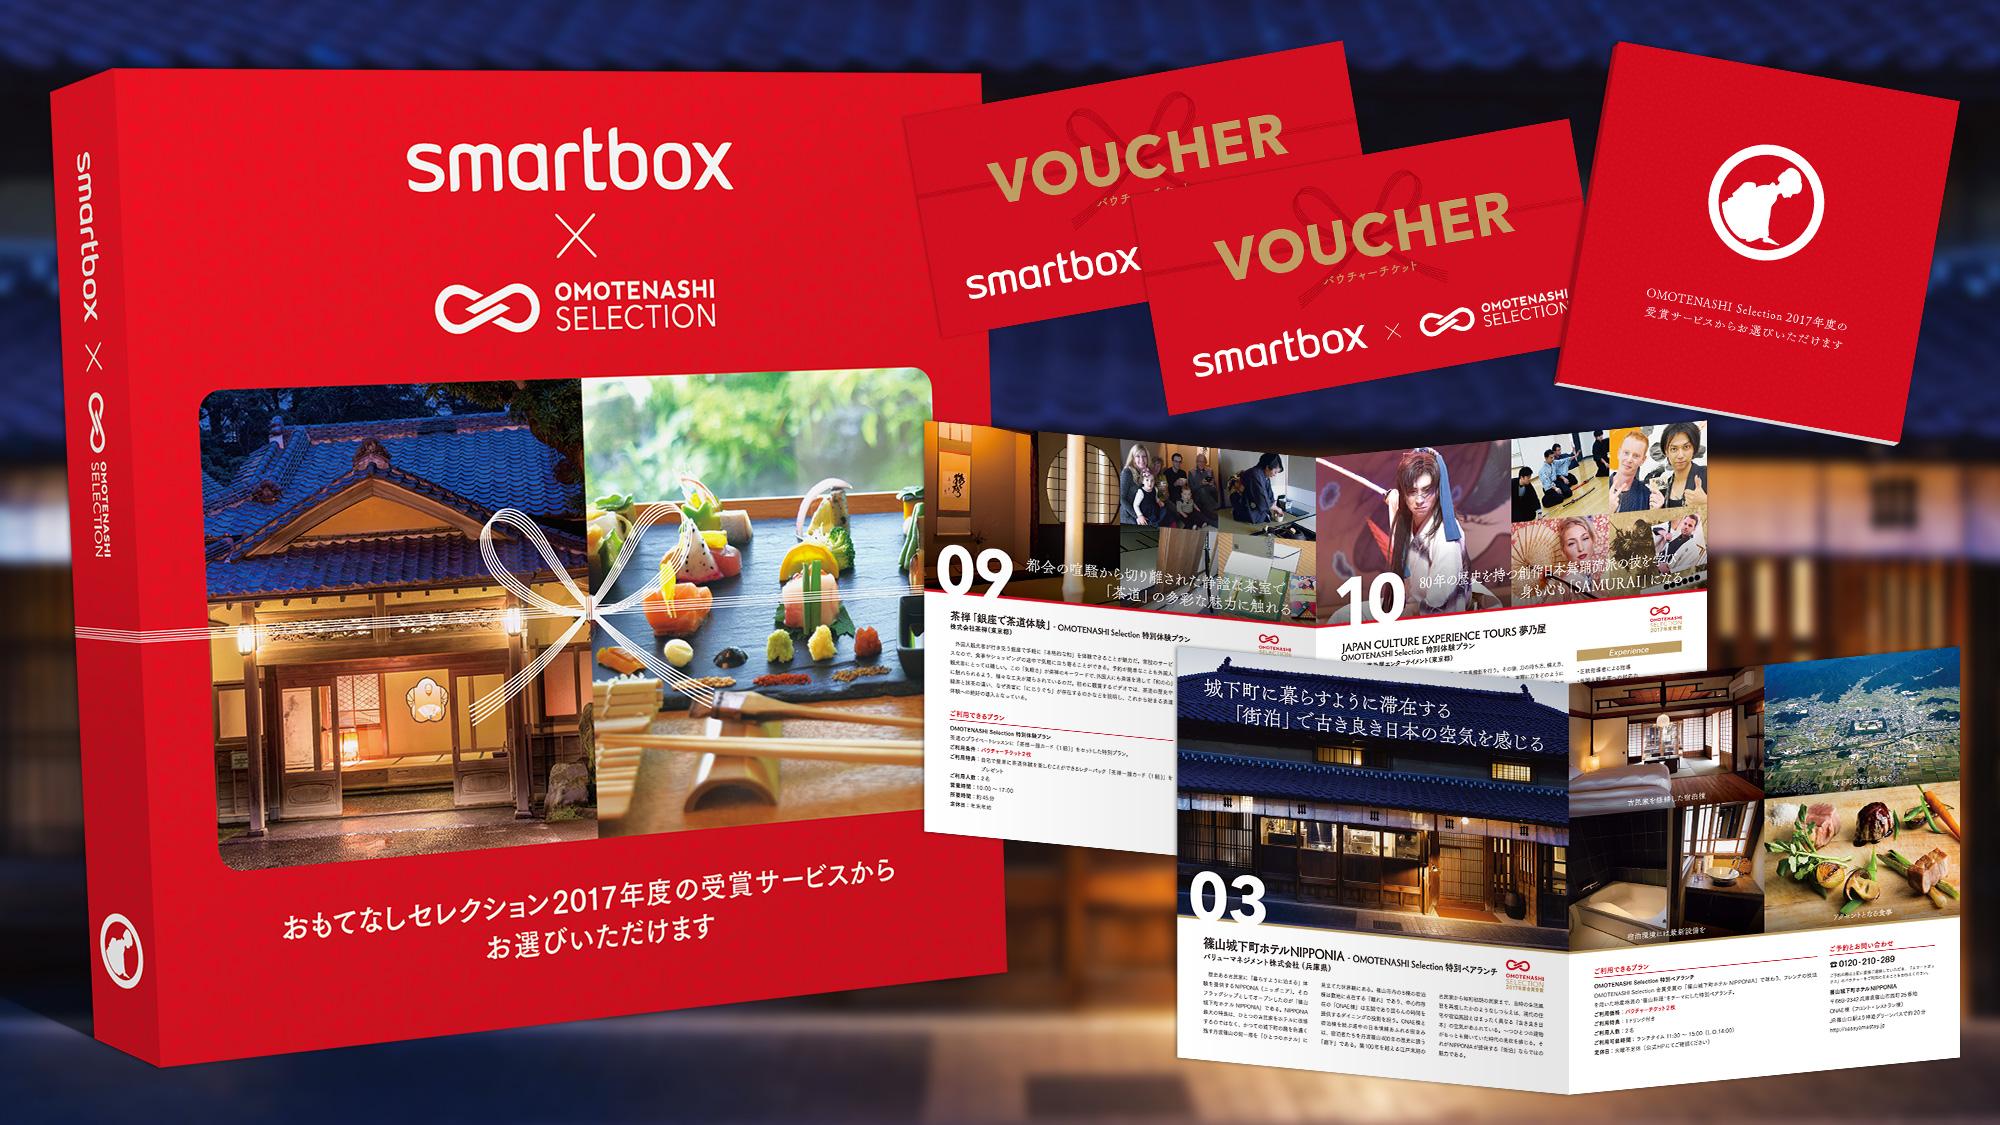 OMOTENASHI Selection 2017 体験ギフトボックス販売開始のお知らせ